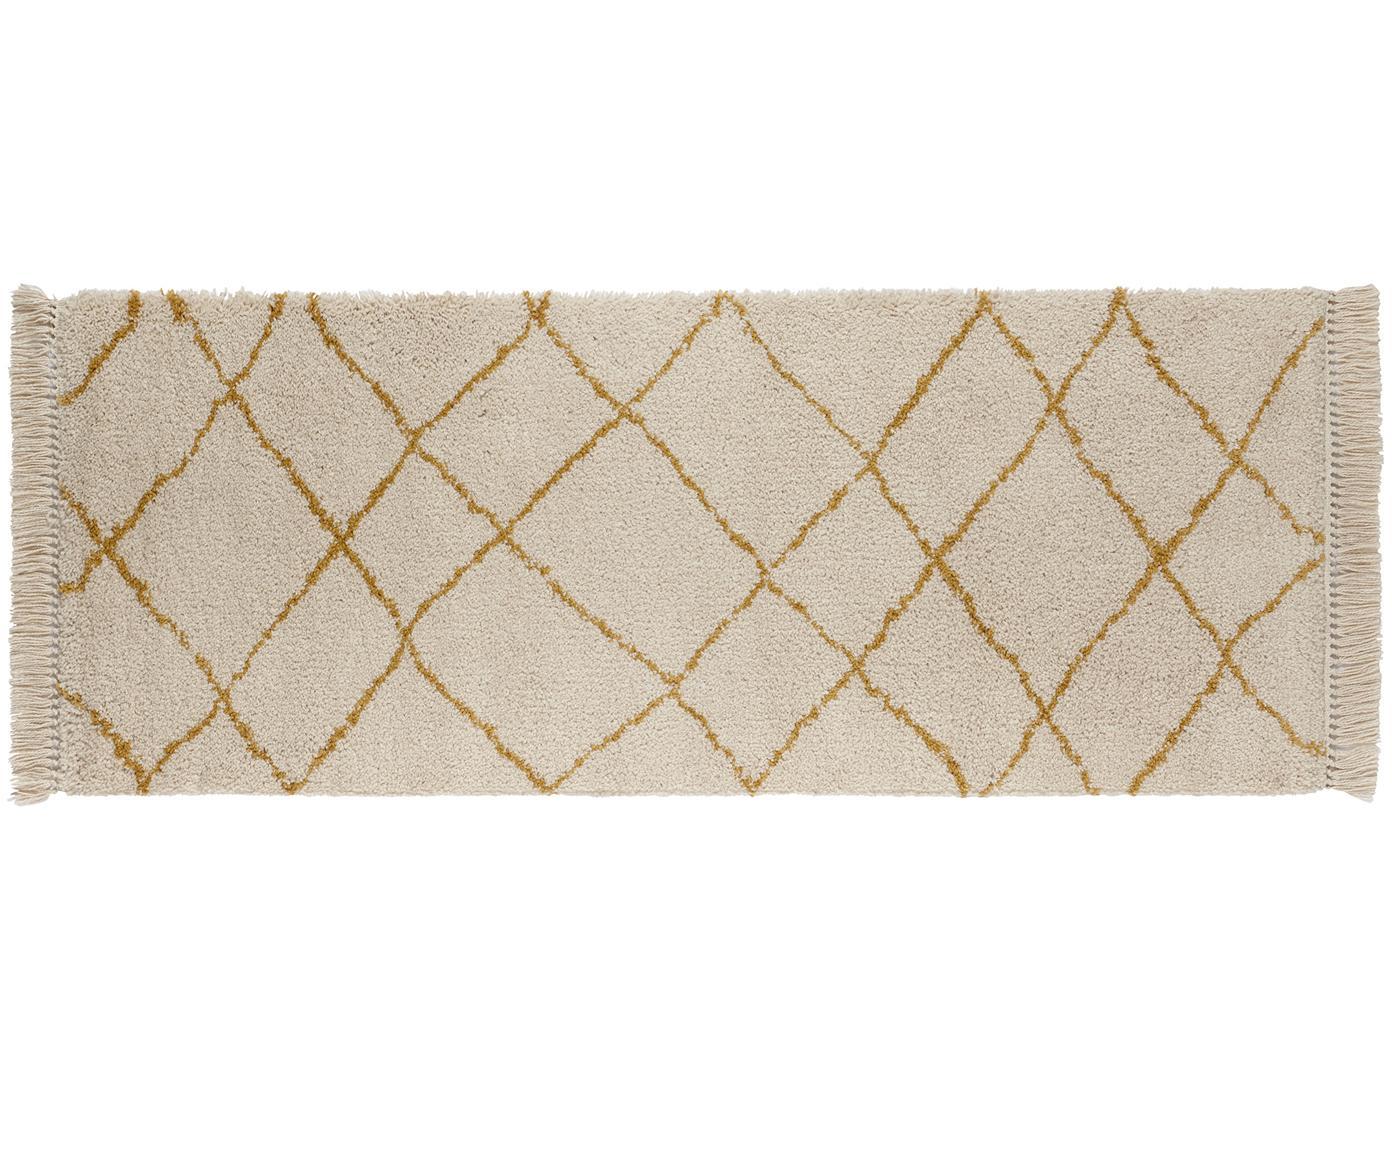 Läufer Primrose, Creme, Goldgelb, 80 x 200 cm